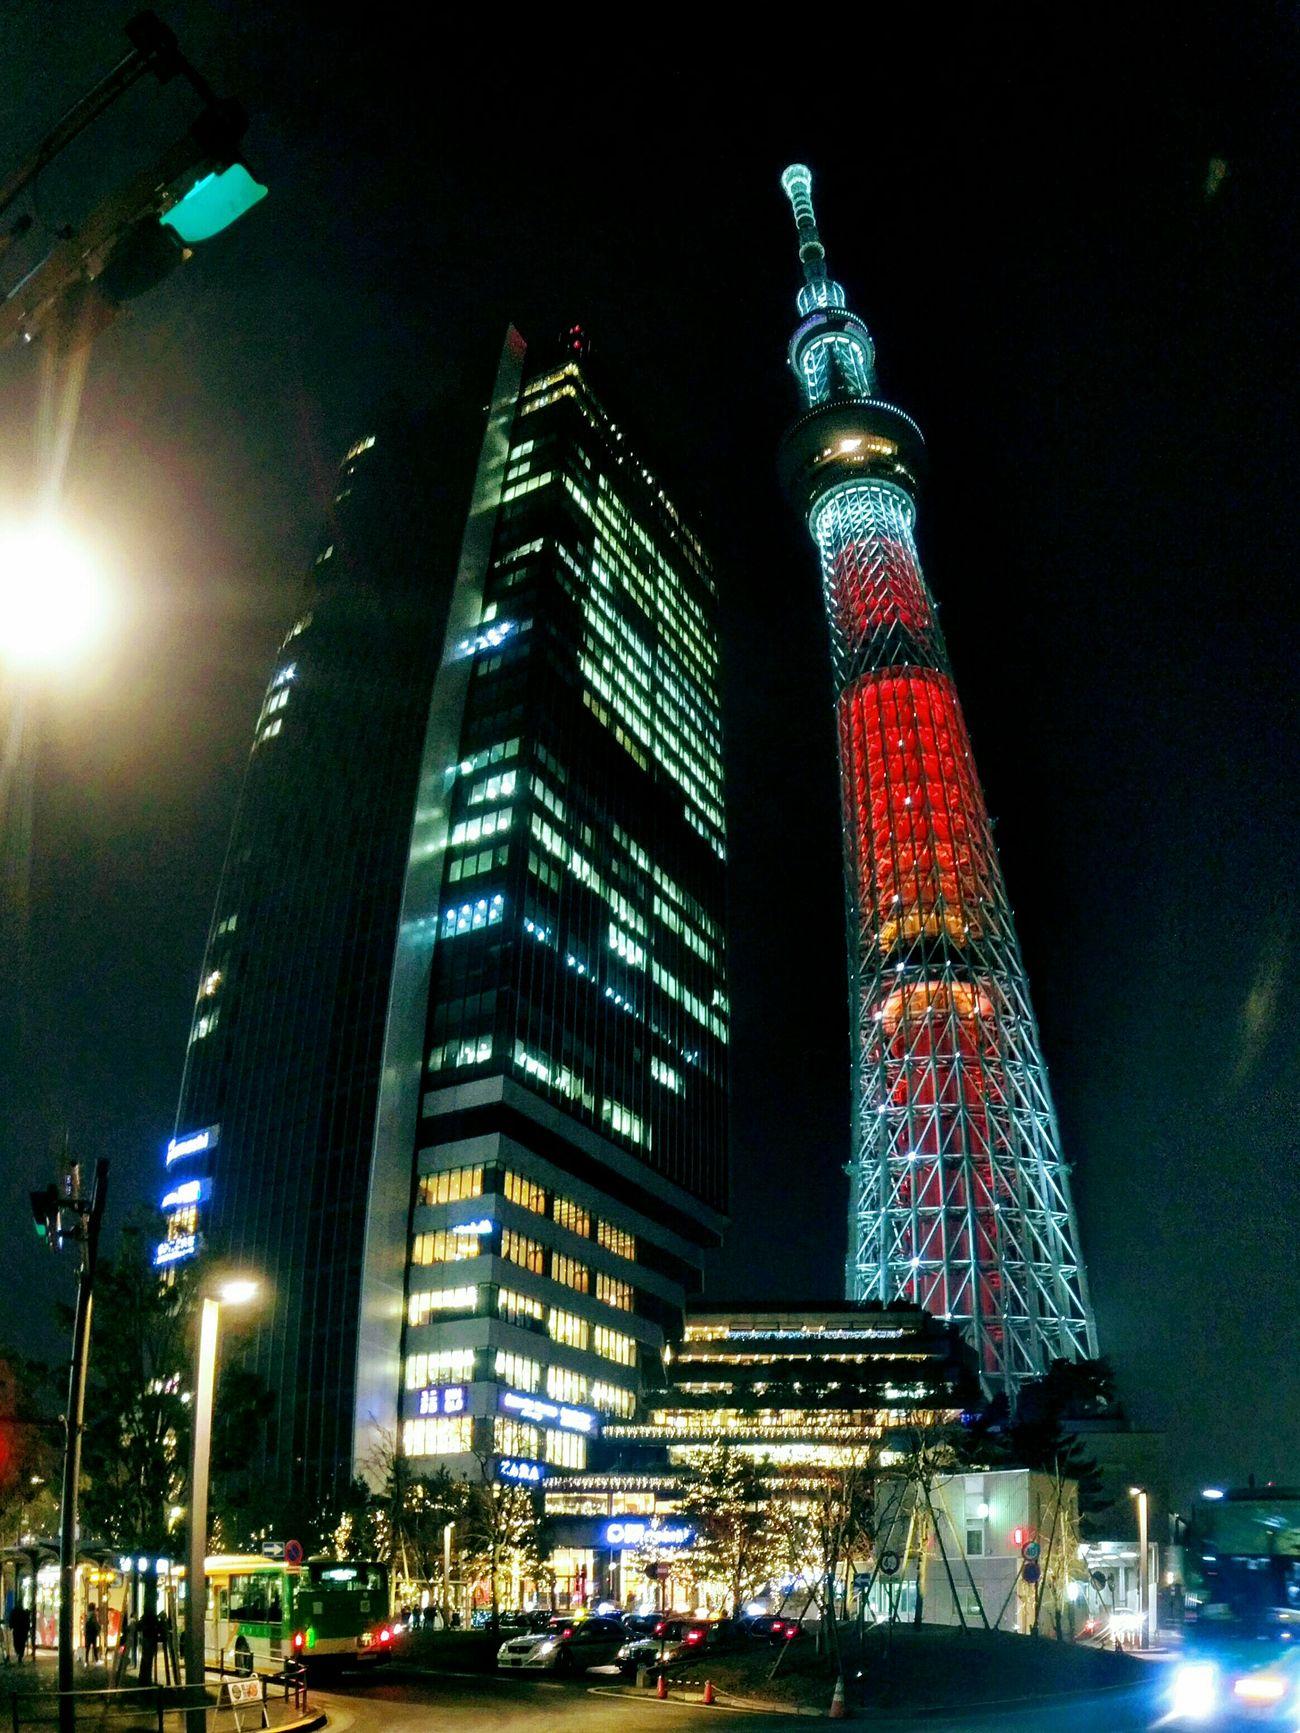 Christmas Illumination Tokyoskytree Light Up クリスマスイルミネーション 東京スカイツリー ライトアップ